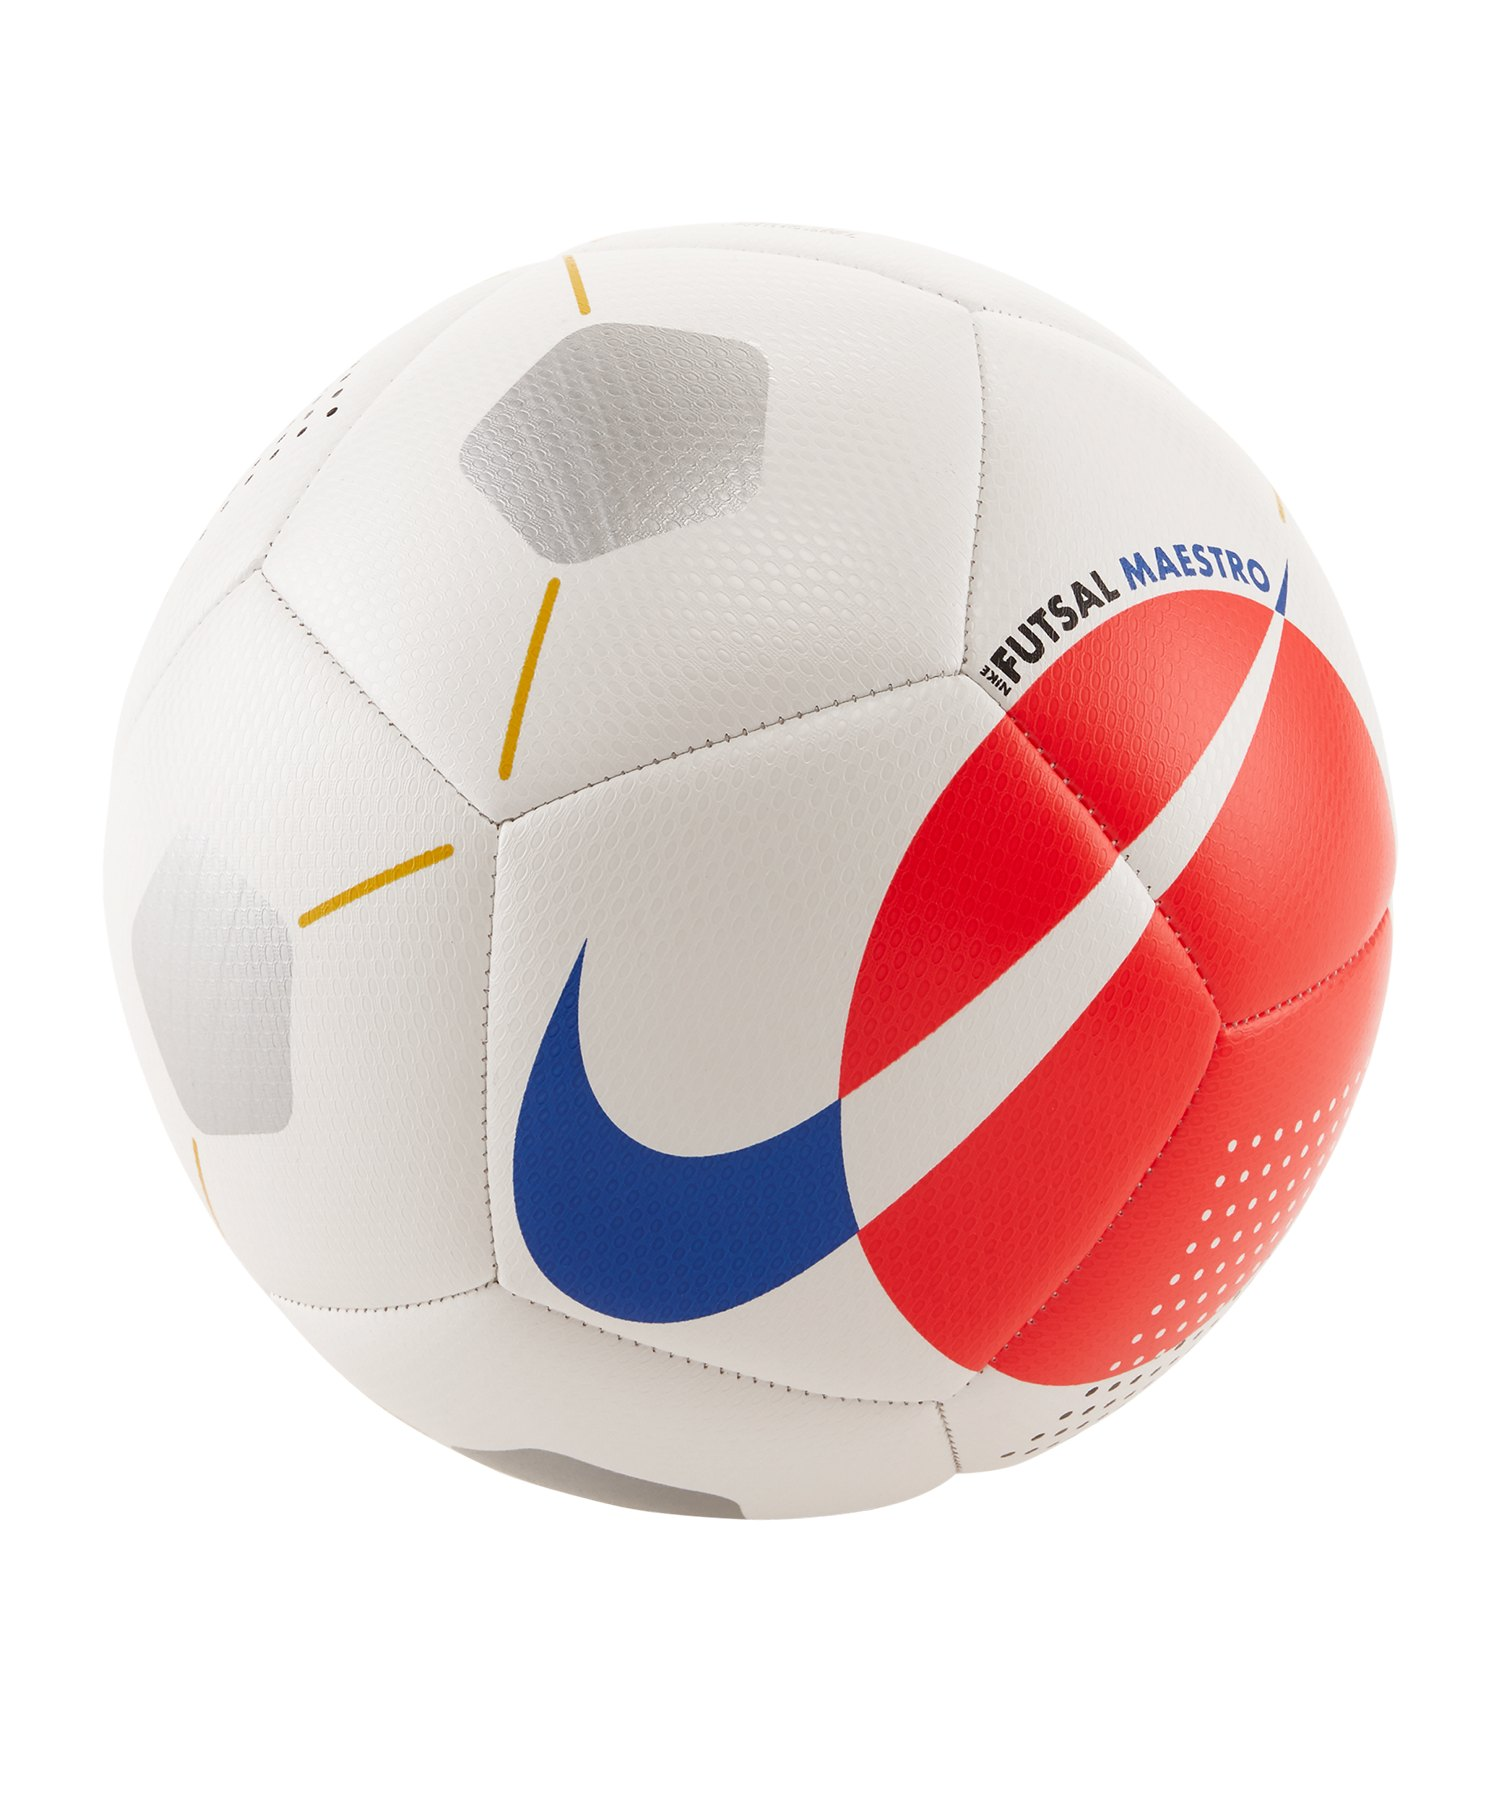 Nike Maestro Trainingsball Weiss Rot F101 - weiss